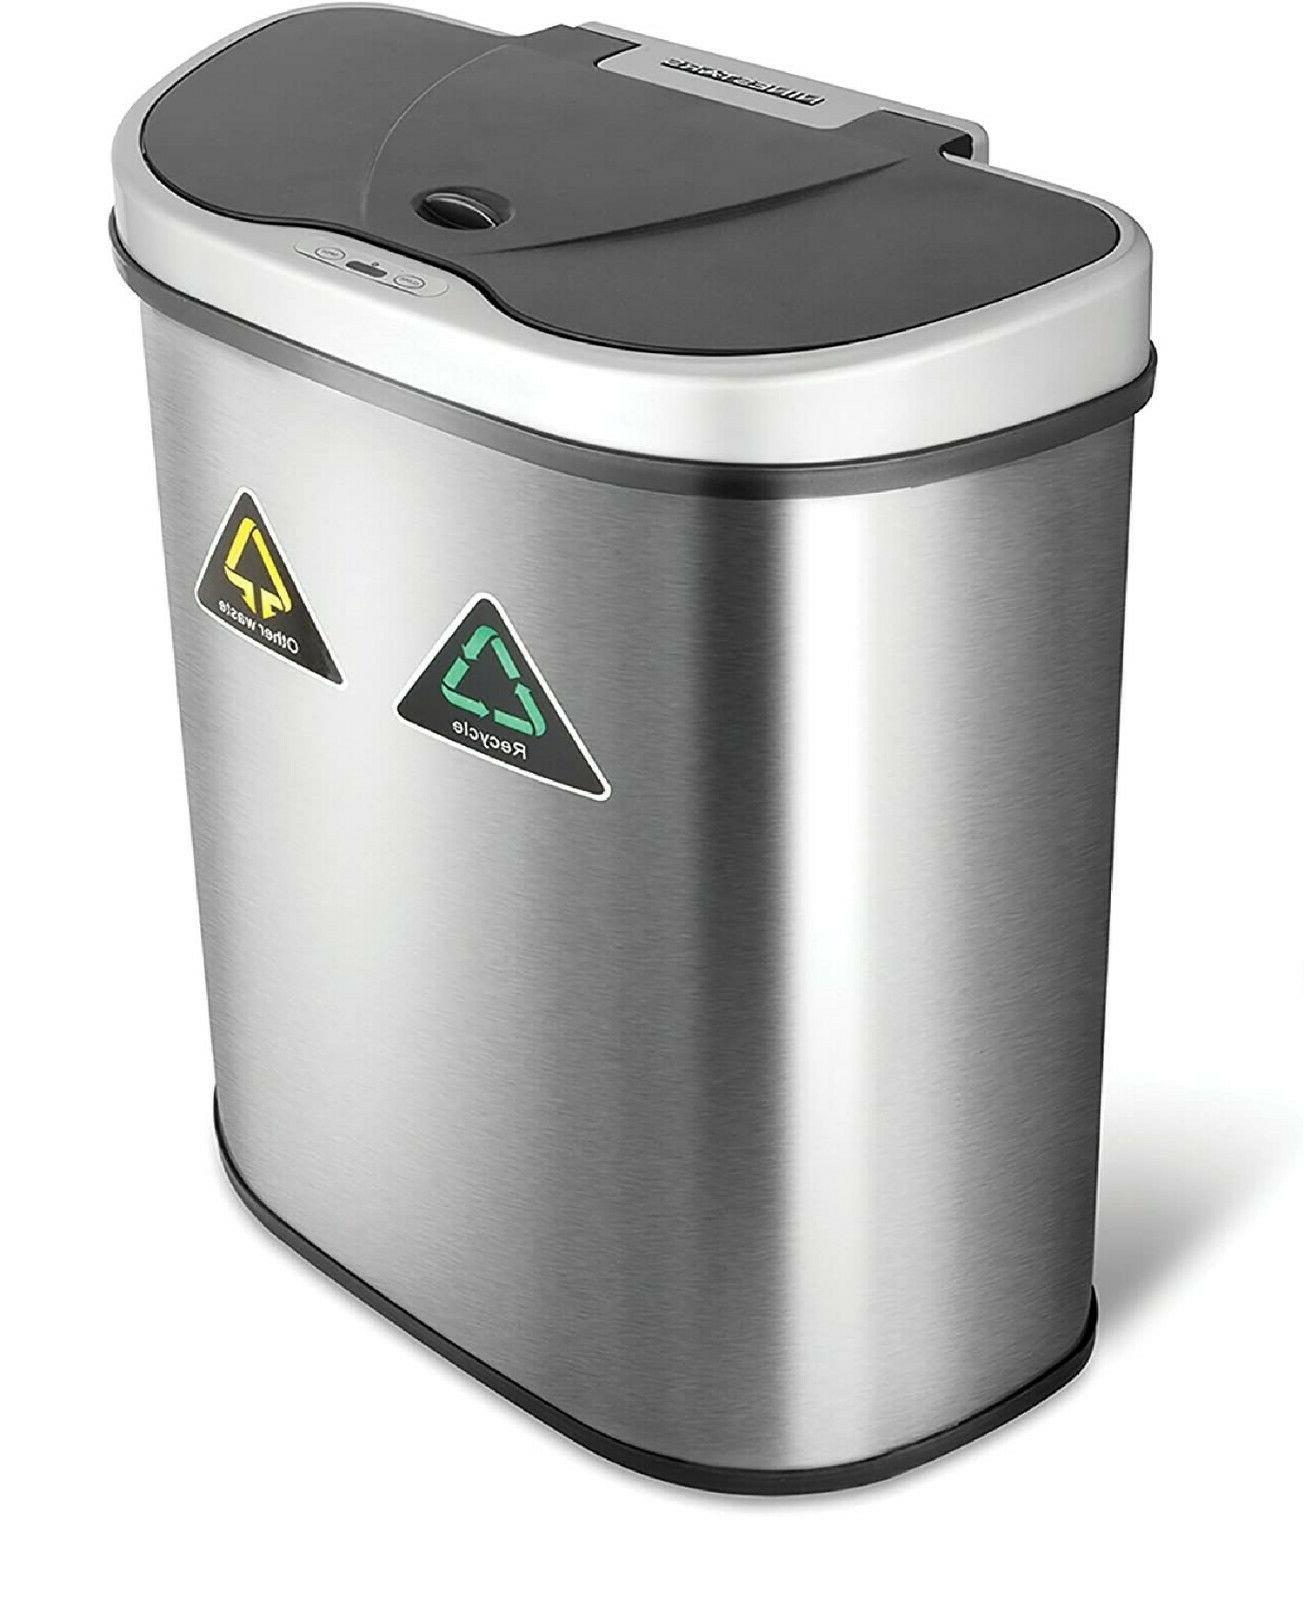 Dual Trash Bin for Garbage with gallon